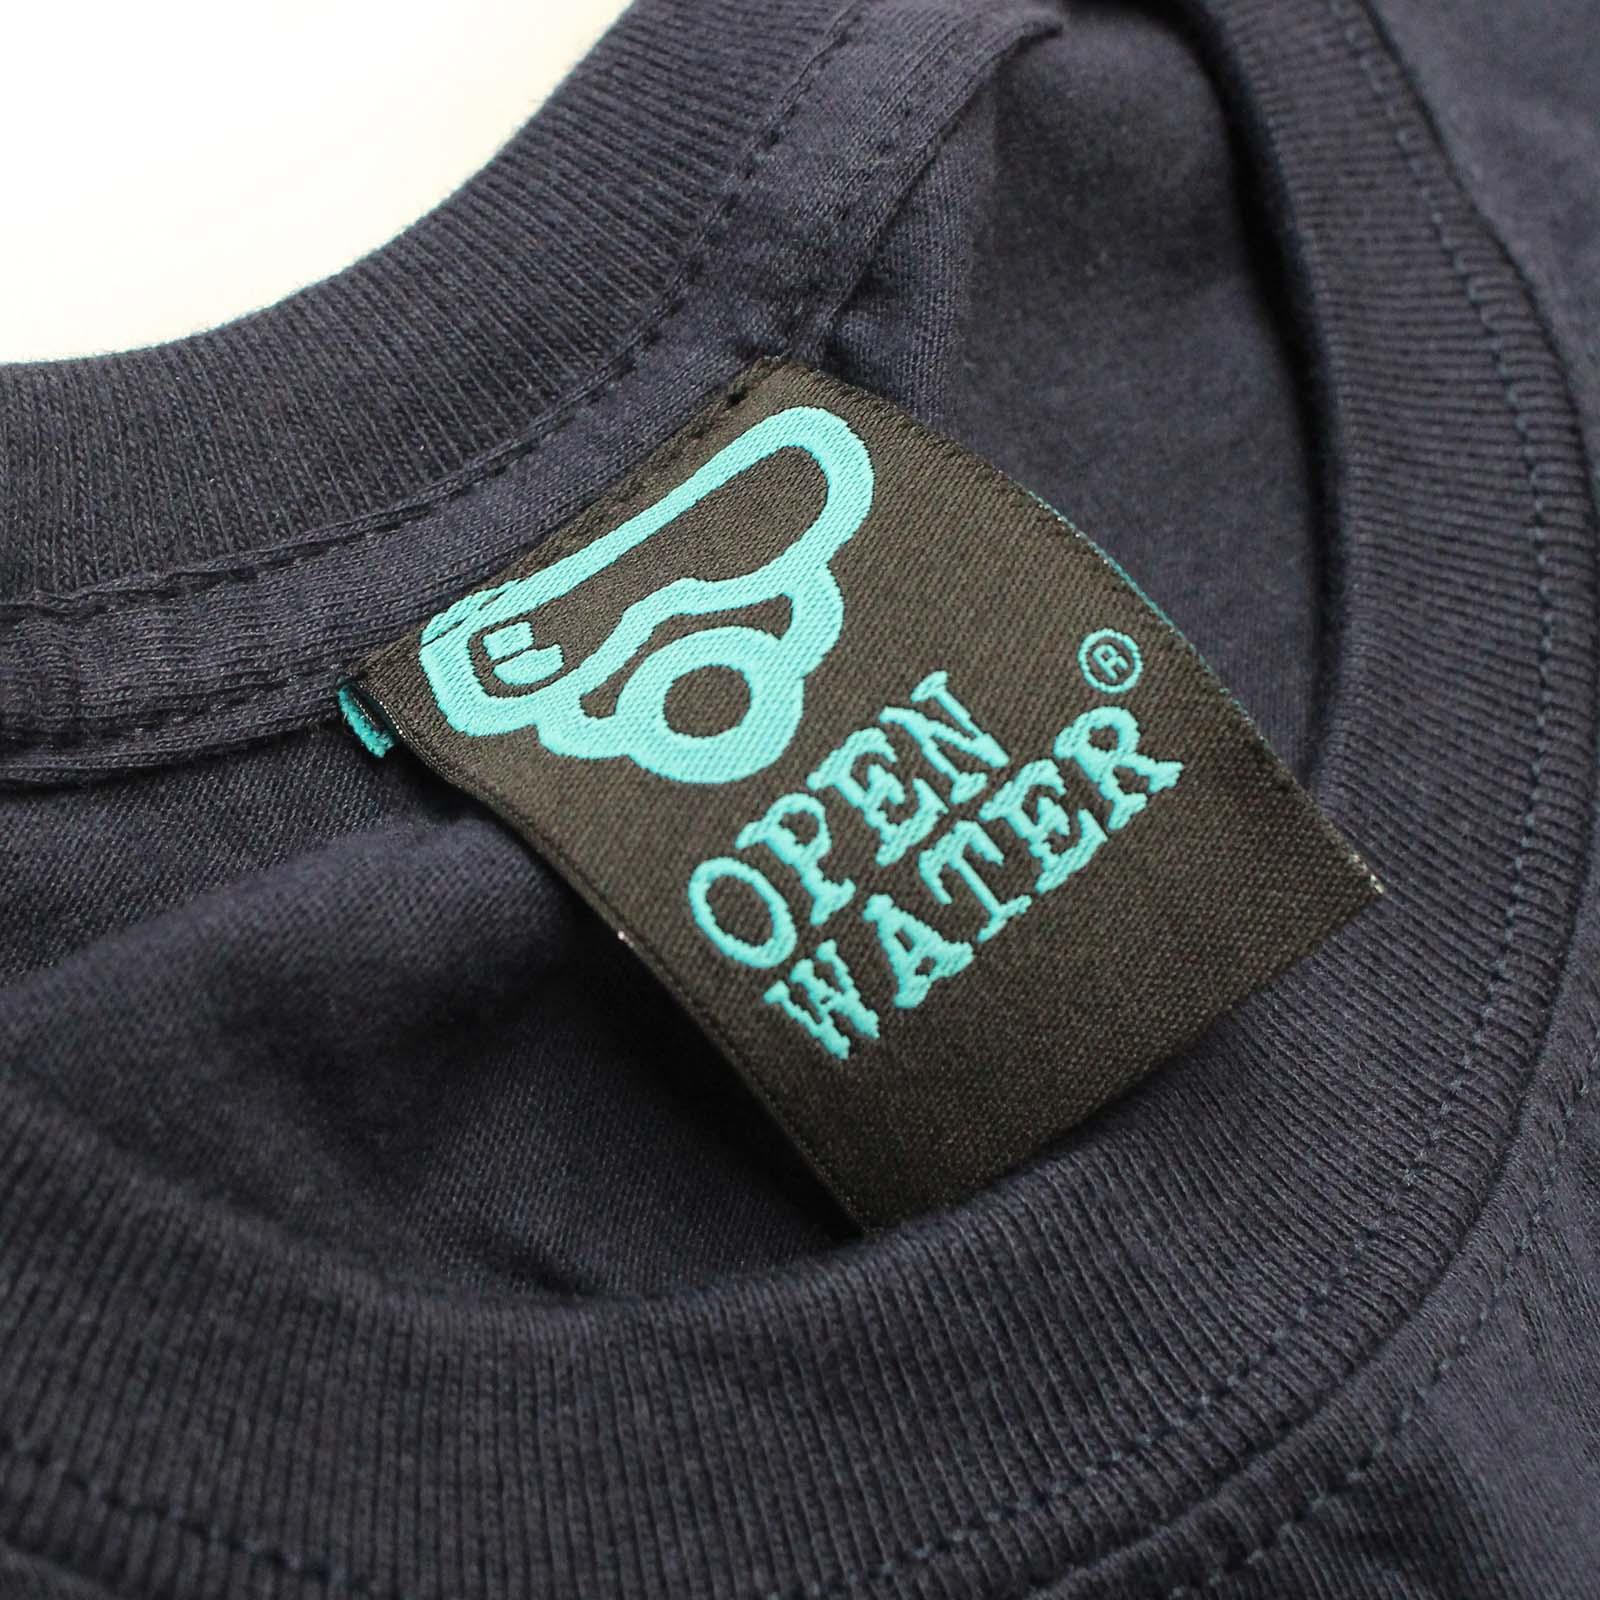 Pulse Scuba Diving T-Shirt Funny Novelty Mens tee TShirt